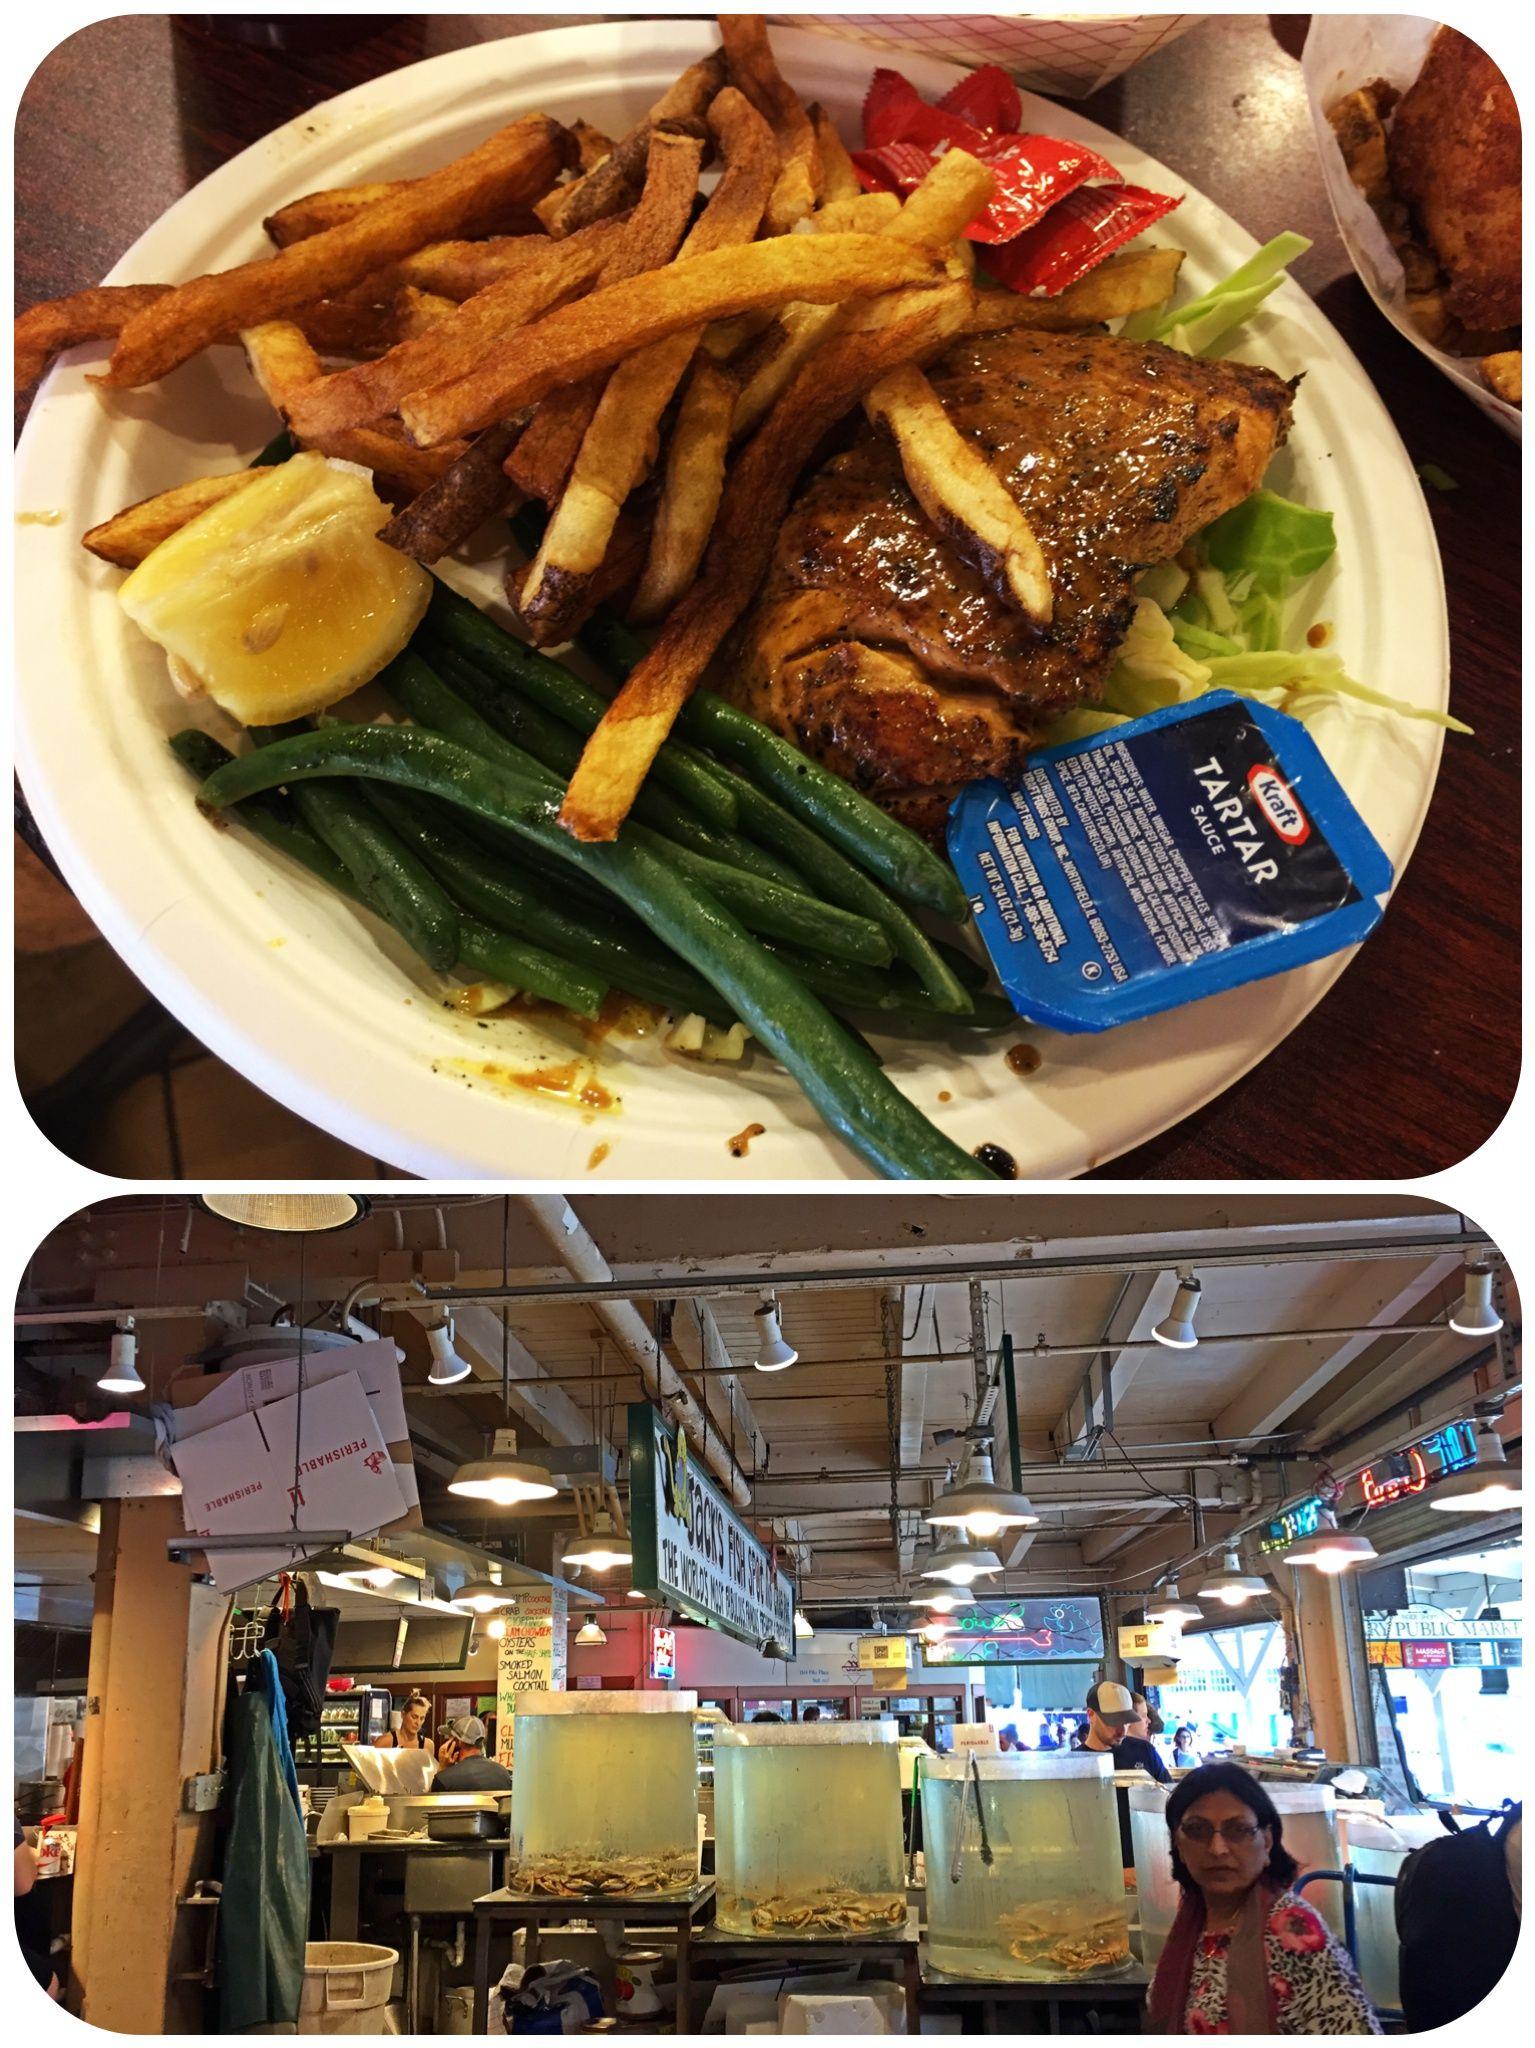 Jacku0027s Fish Spot in Pike Place Market